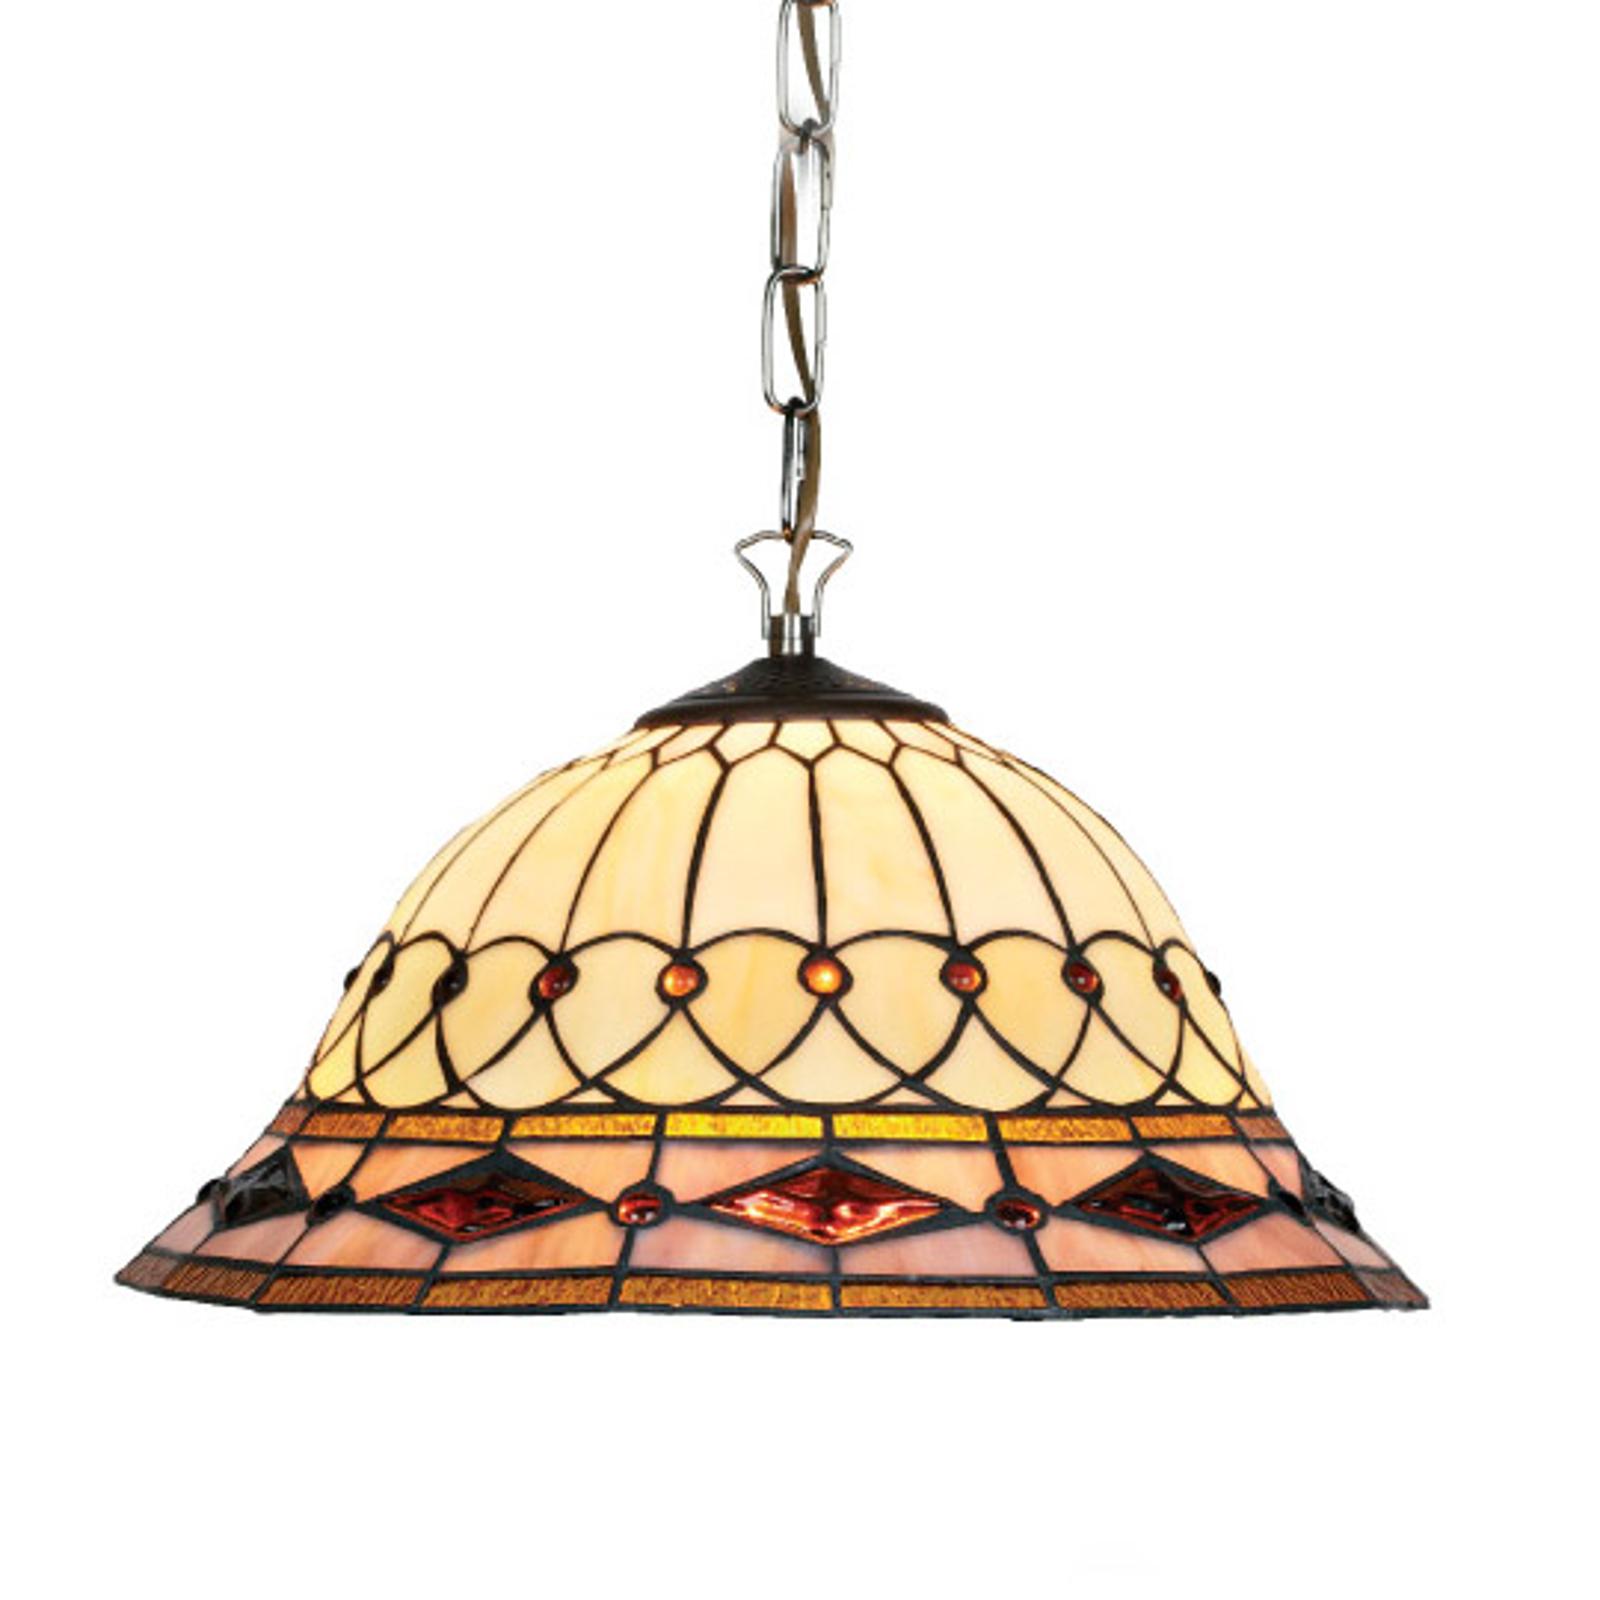 Hanging light Cassandra, Tiffany-style, 2-bulb_1032113_1